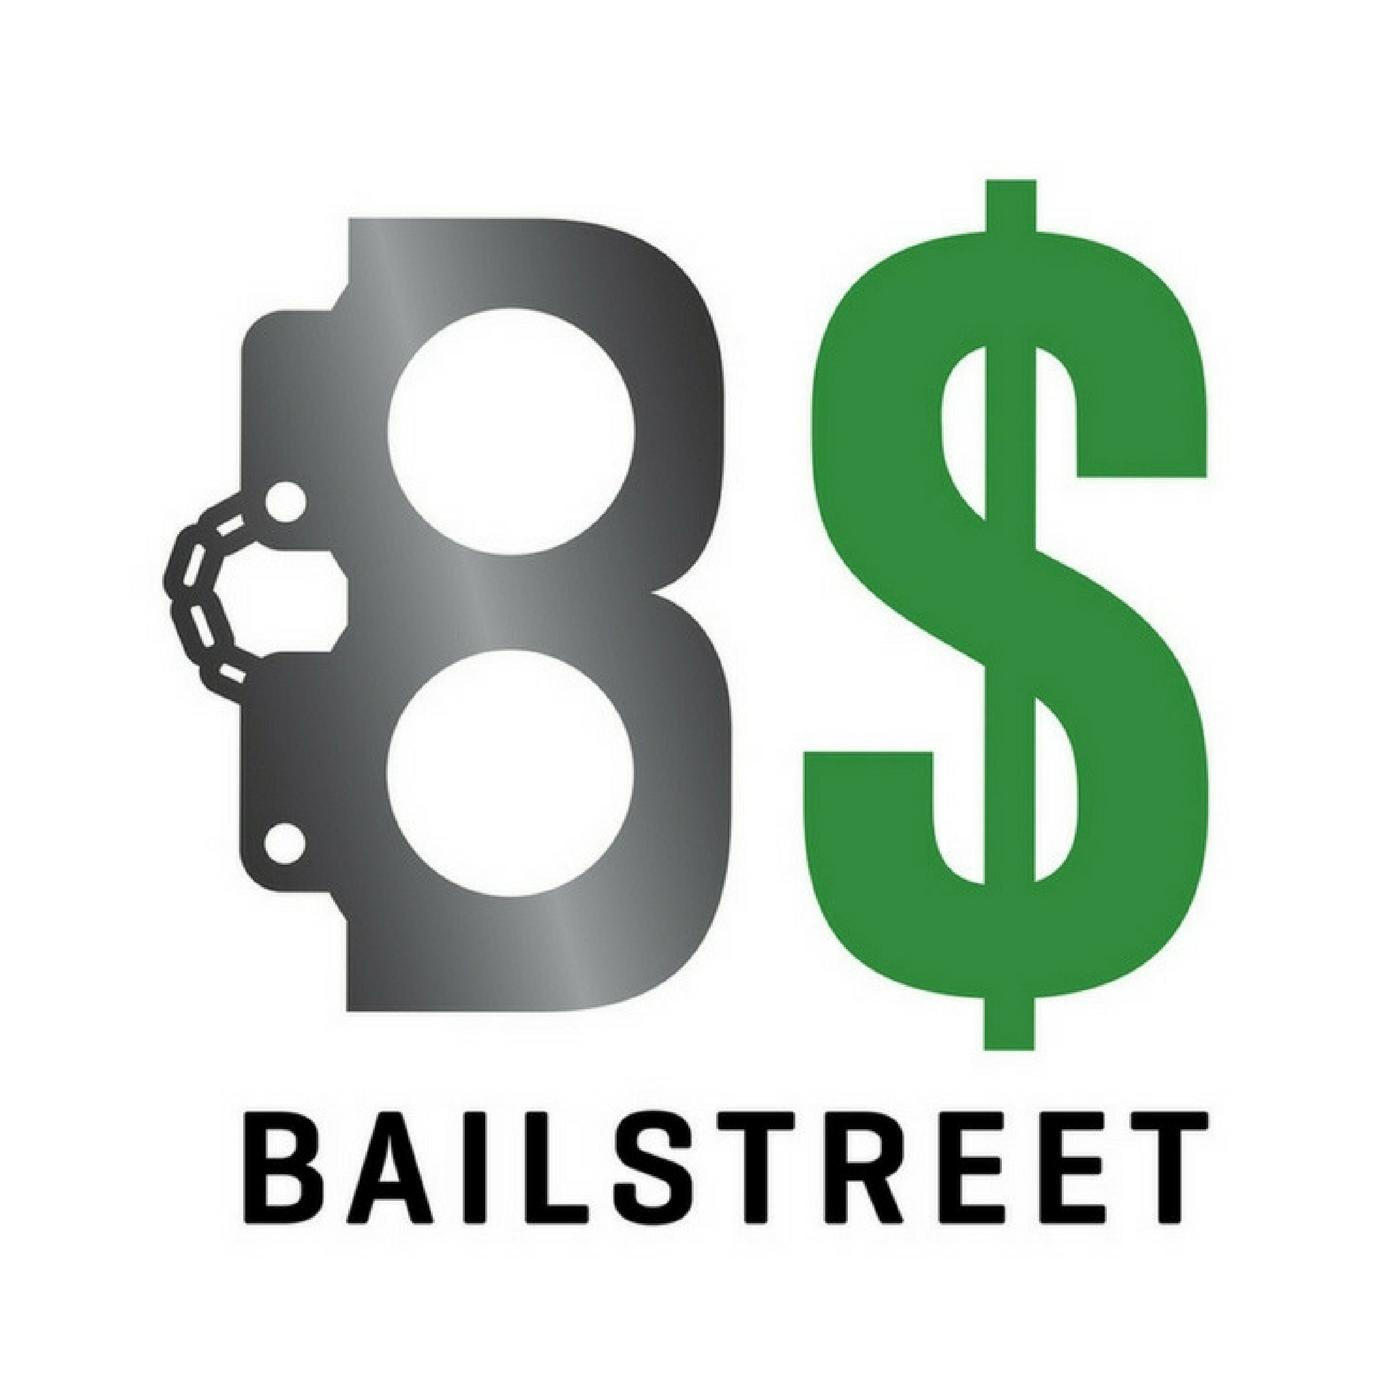 BAILSTREET show image